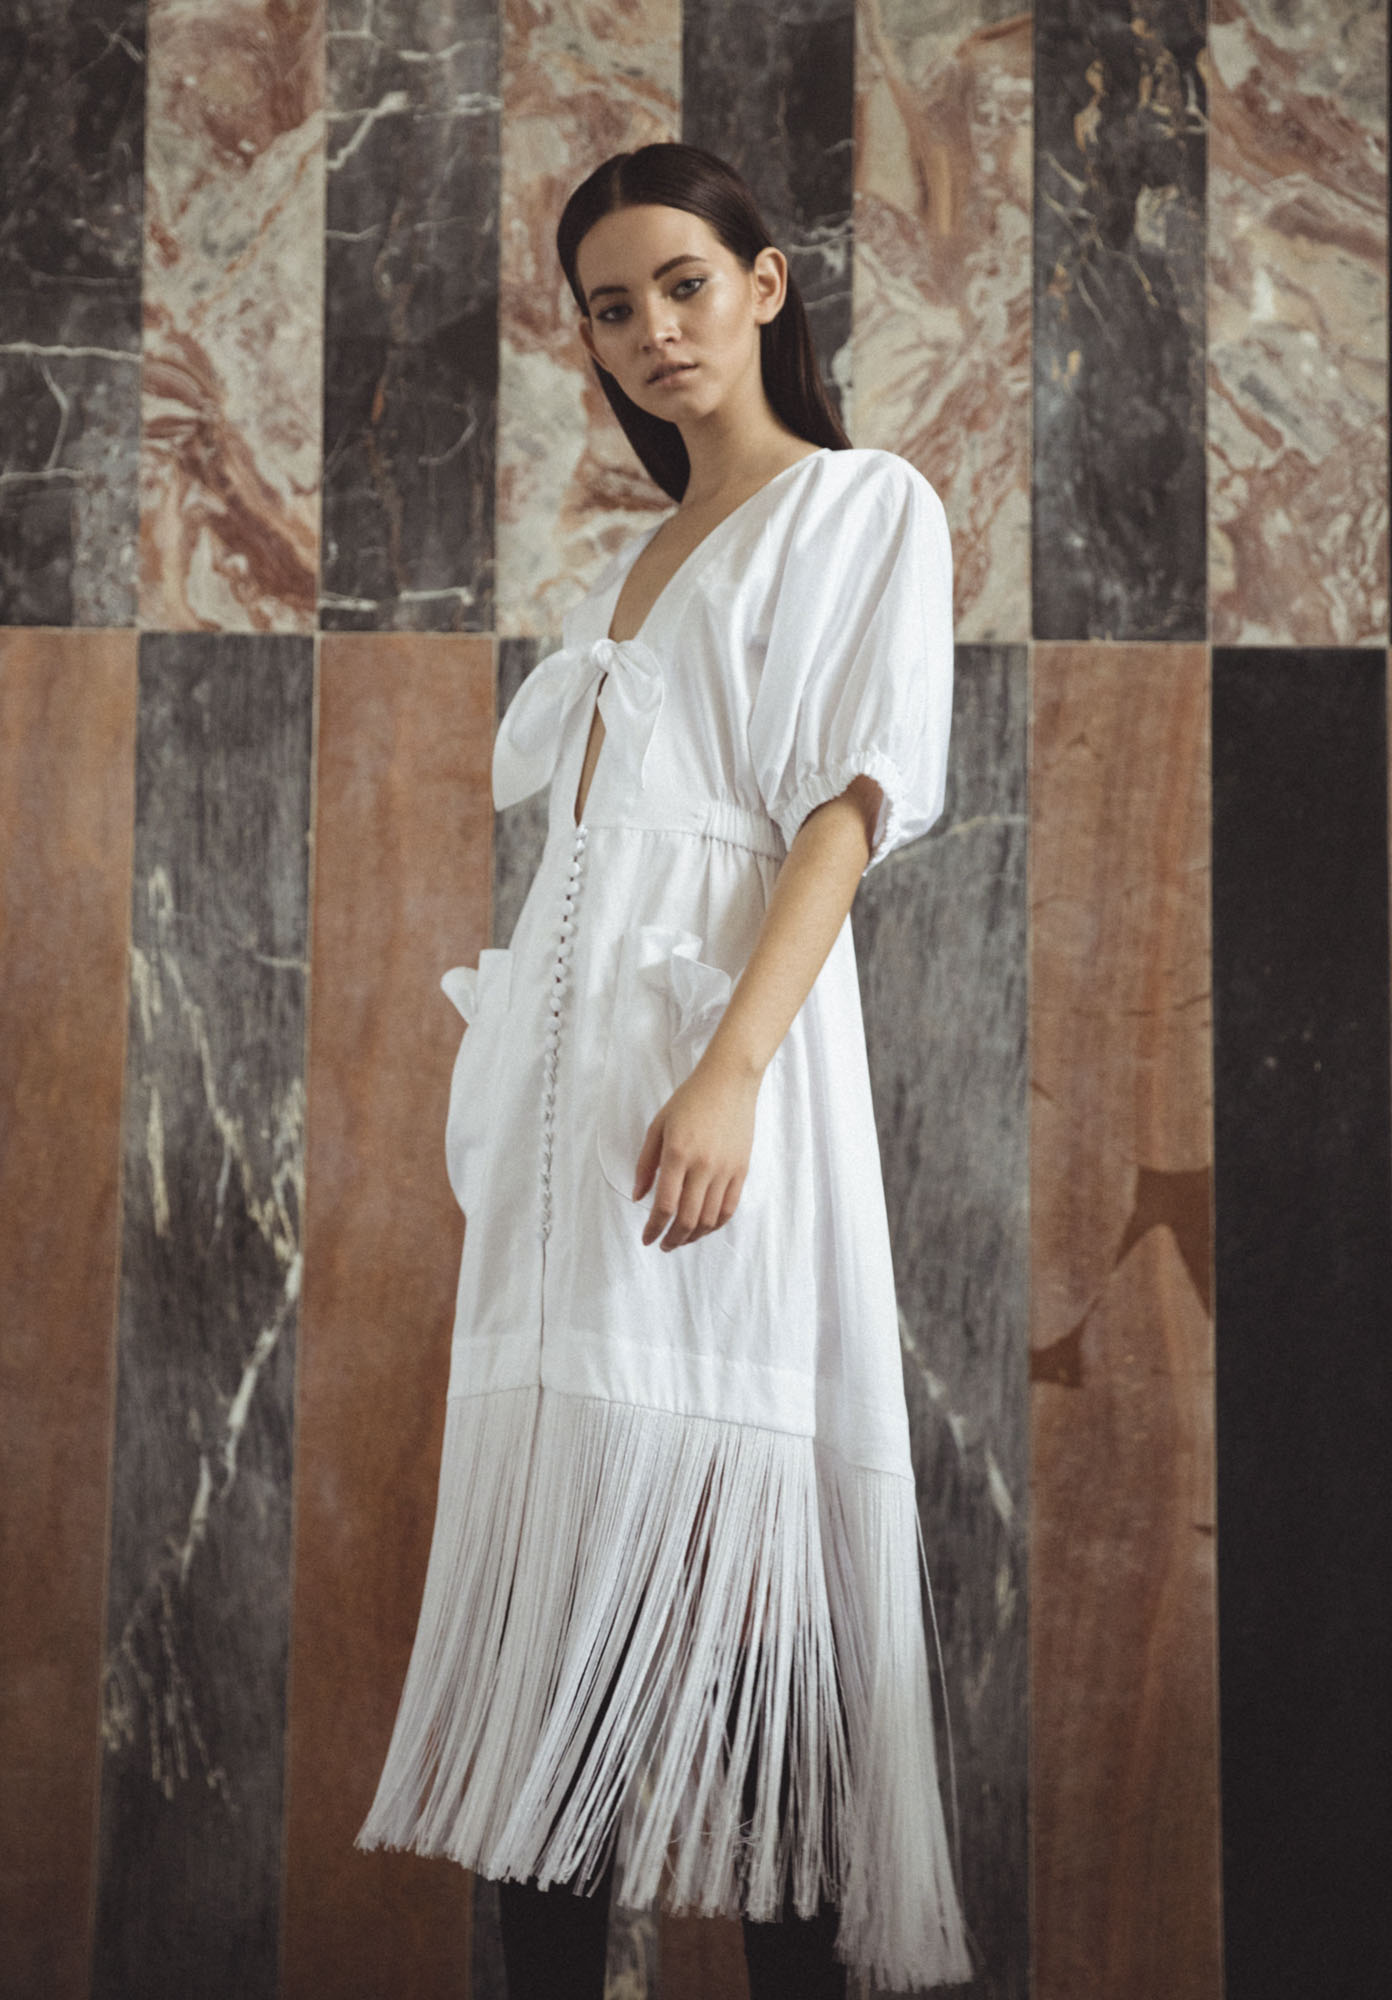 efrain_mogollon_femineus_alessia_ dress.JPG